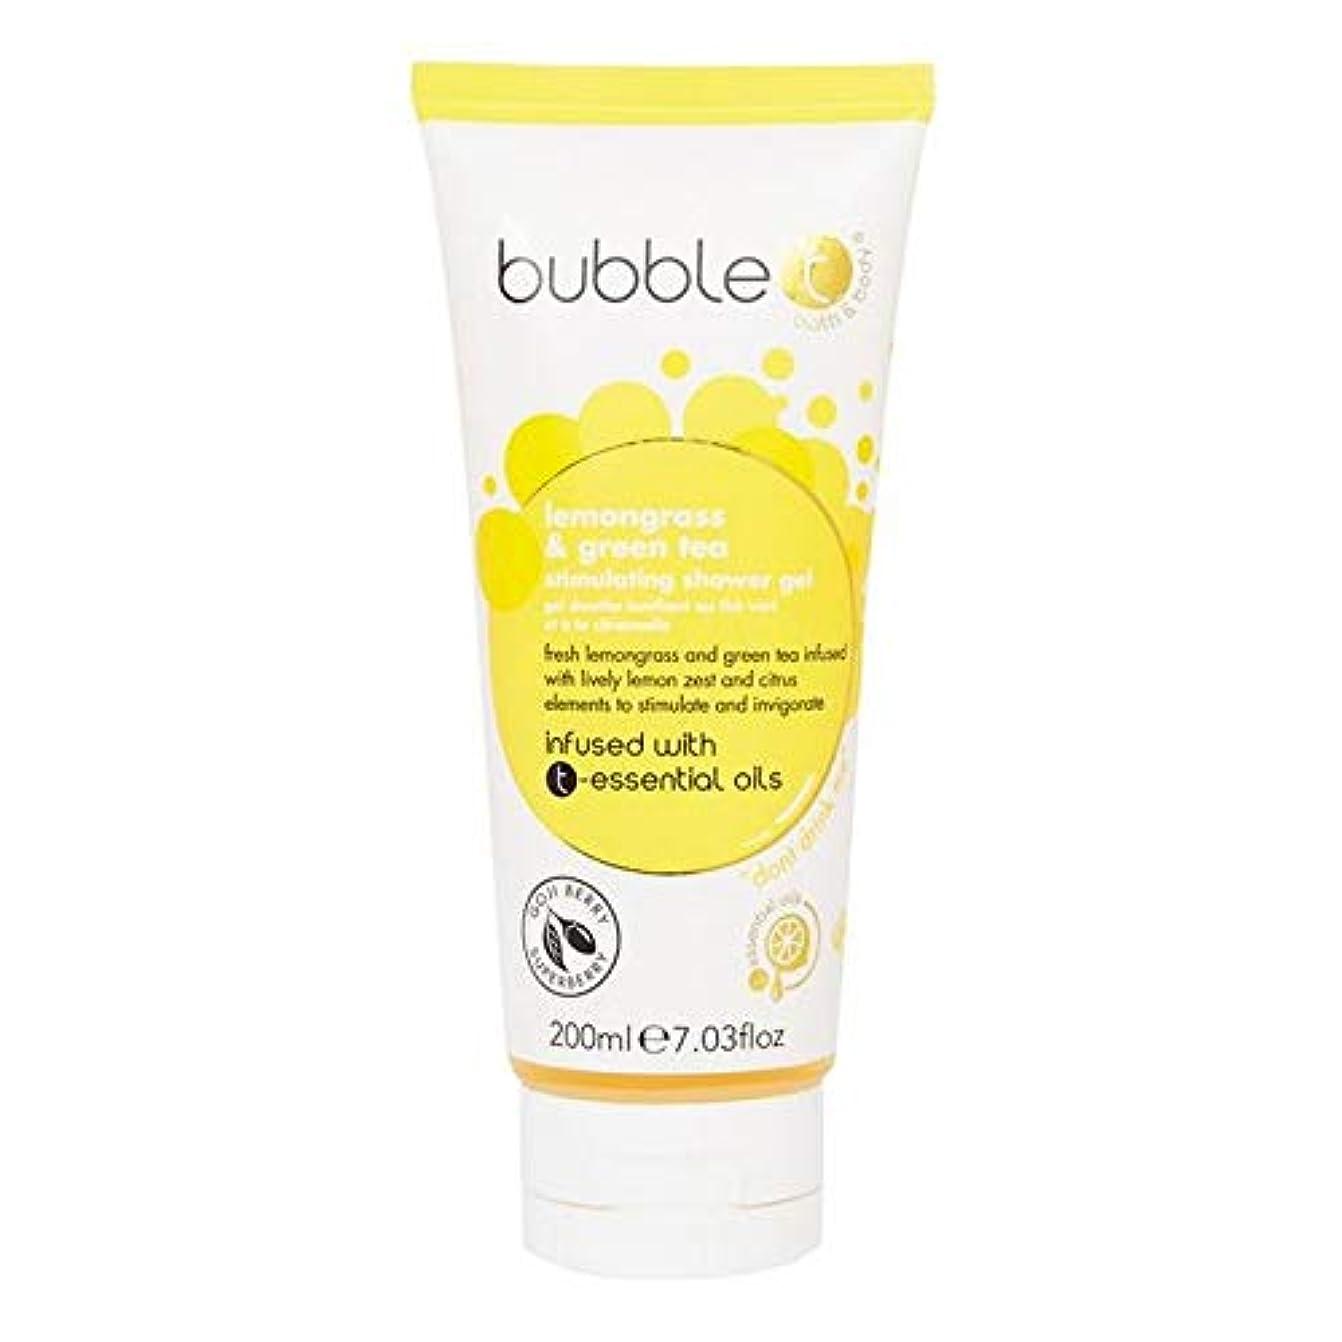 [Bubble T ] バブルトン化粧品シャワージェル、レモングラス&緑茶200ミリリットル - Bubble T Cosmetics Shower Gel, Lemongrass & Green Tea 200ml [...